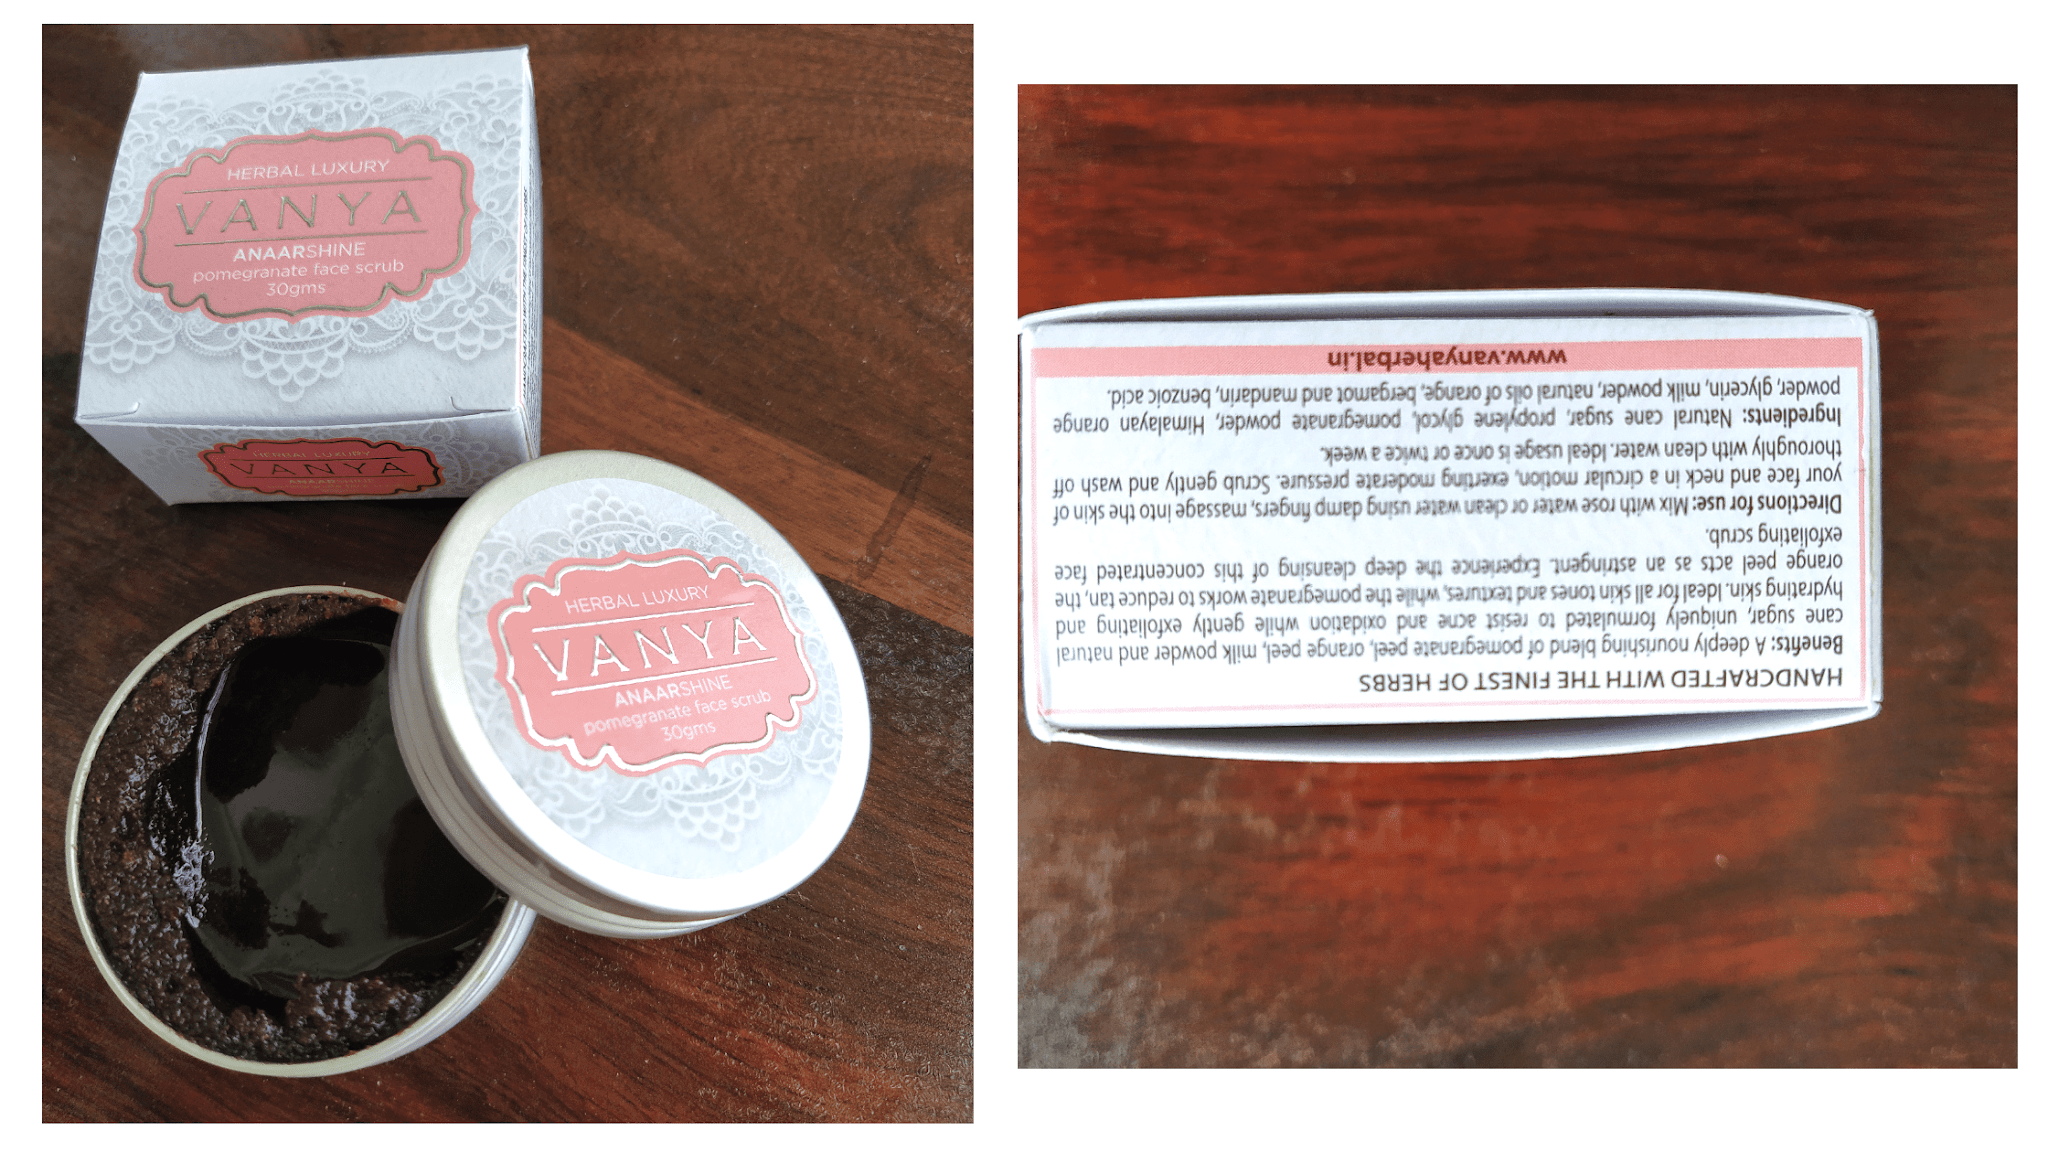 Vanya pomegranate scrub for face